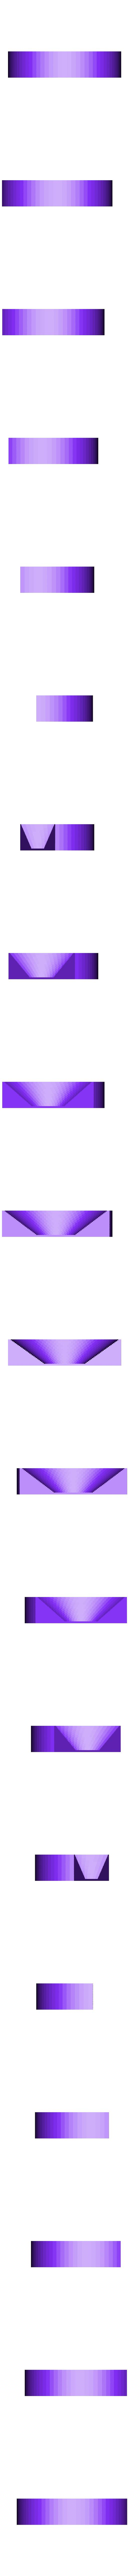 marvin game_lyon_théâtre antique_symboleo_bdl.stl Download free STL file ANTIQUE THEATER - MARVIN GAME - LYON • 3D printing design, symbo_leo